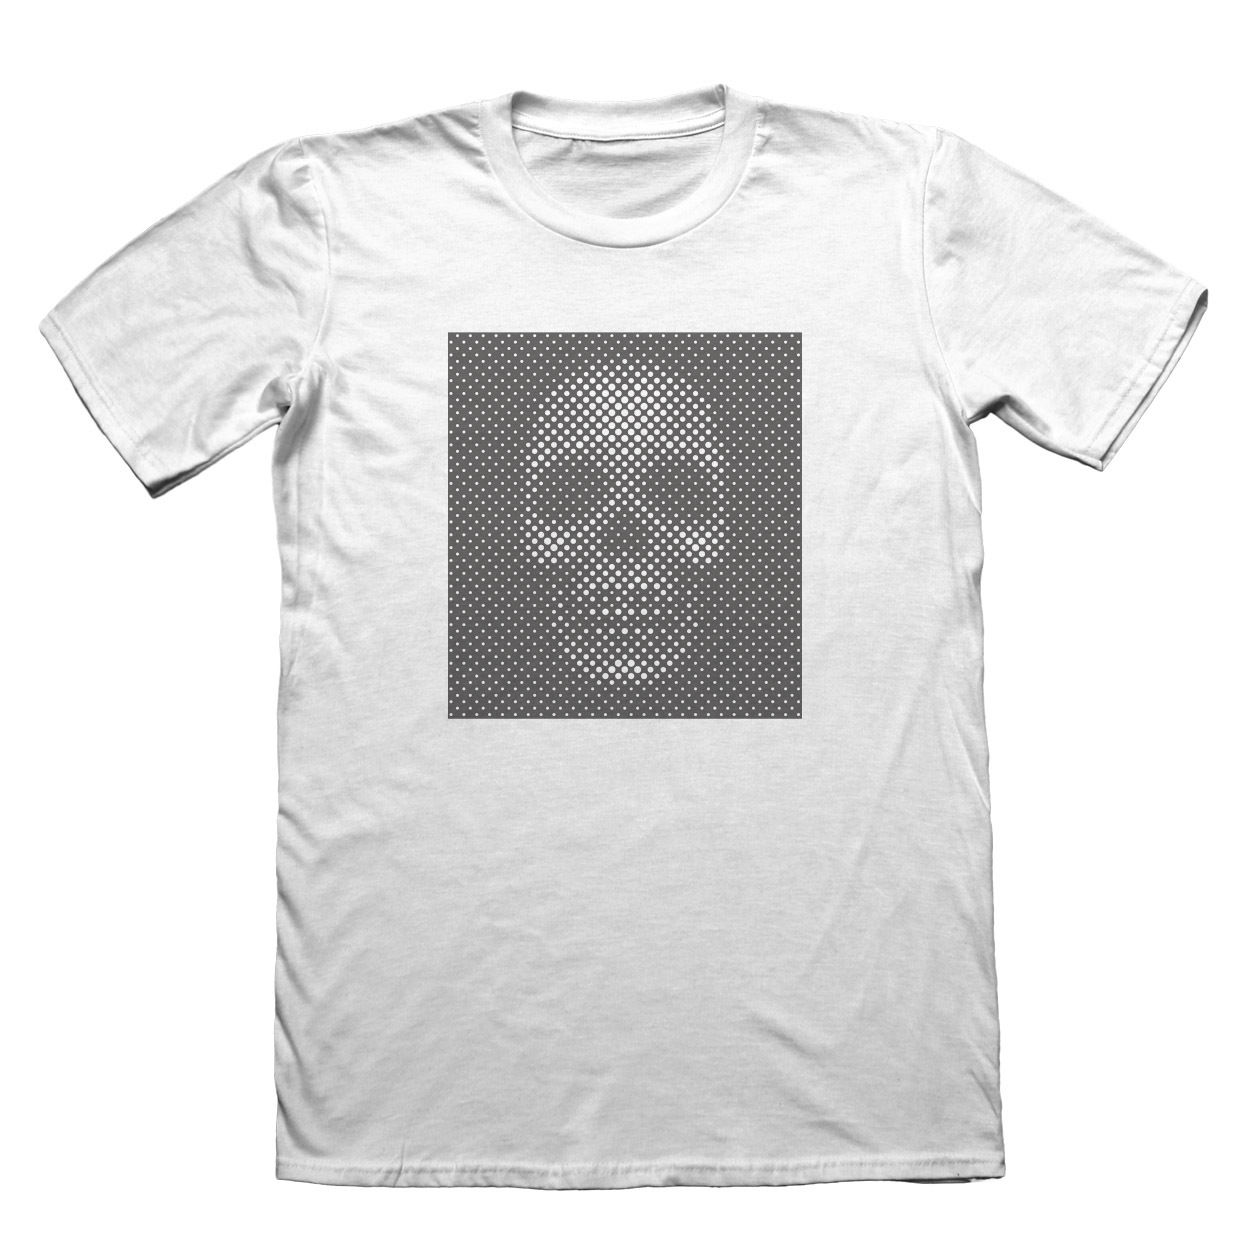 Dot-matrix Skull T-Shirt - Mens Fathers Day Christmas #7684